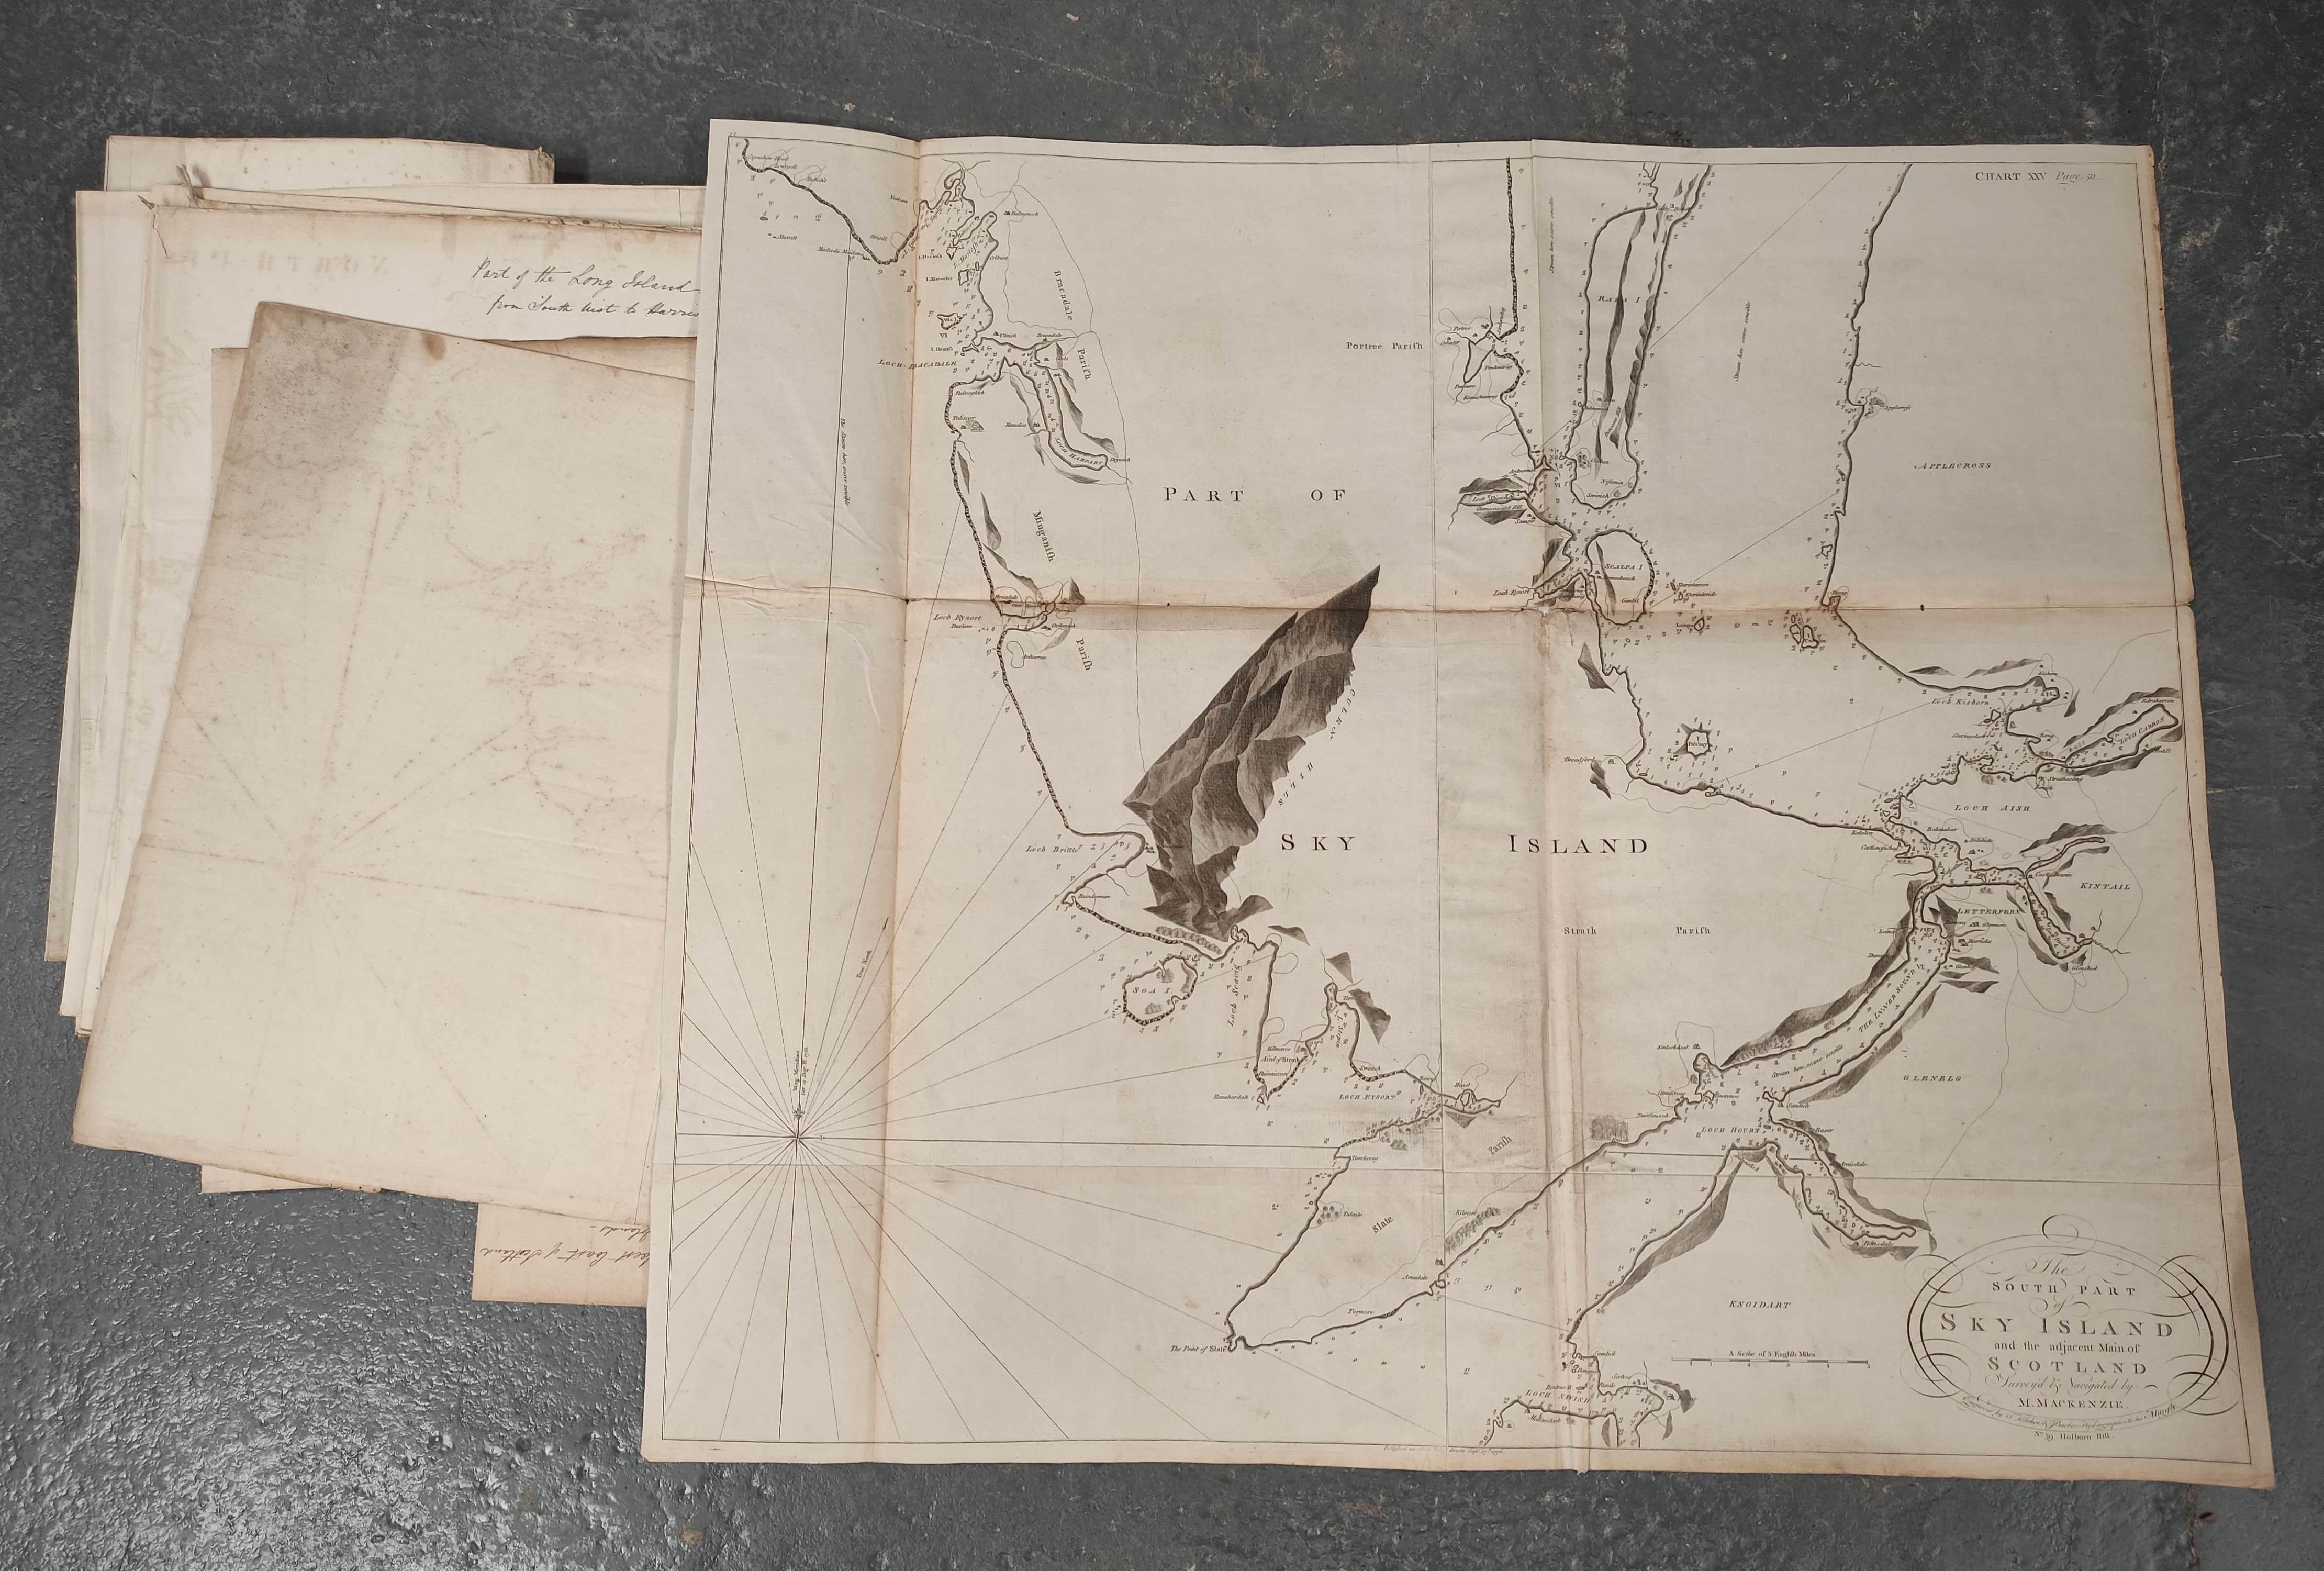 MACKENZIE MURDOCH (SNR.).A General Chart of the West Coast & Western Islands of Scotland from